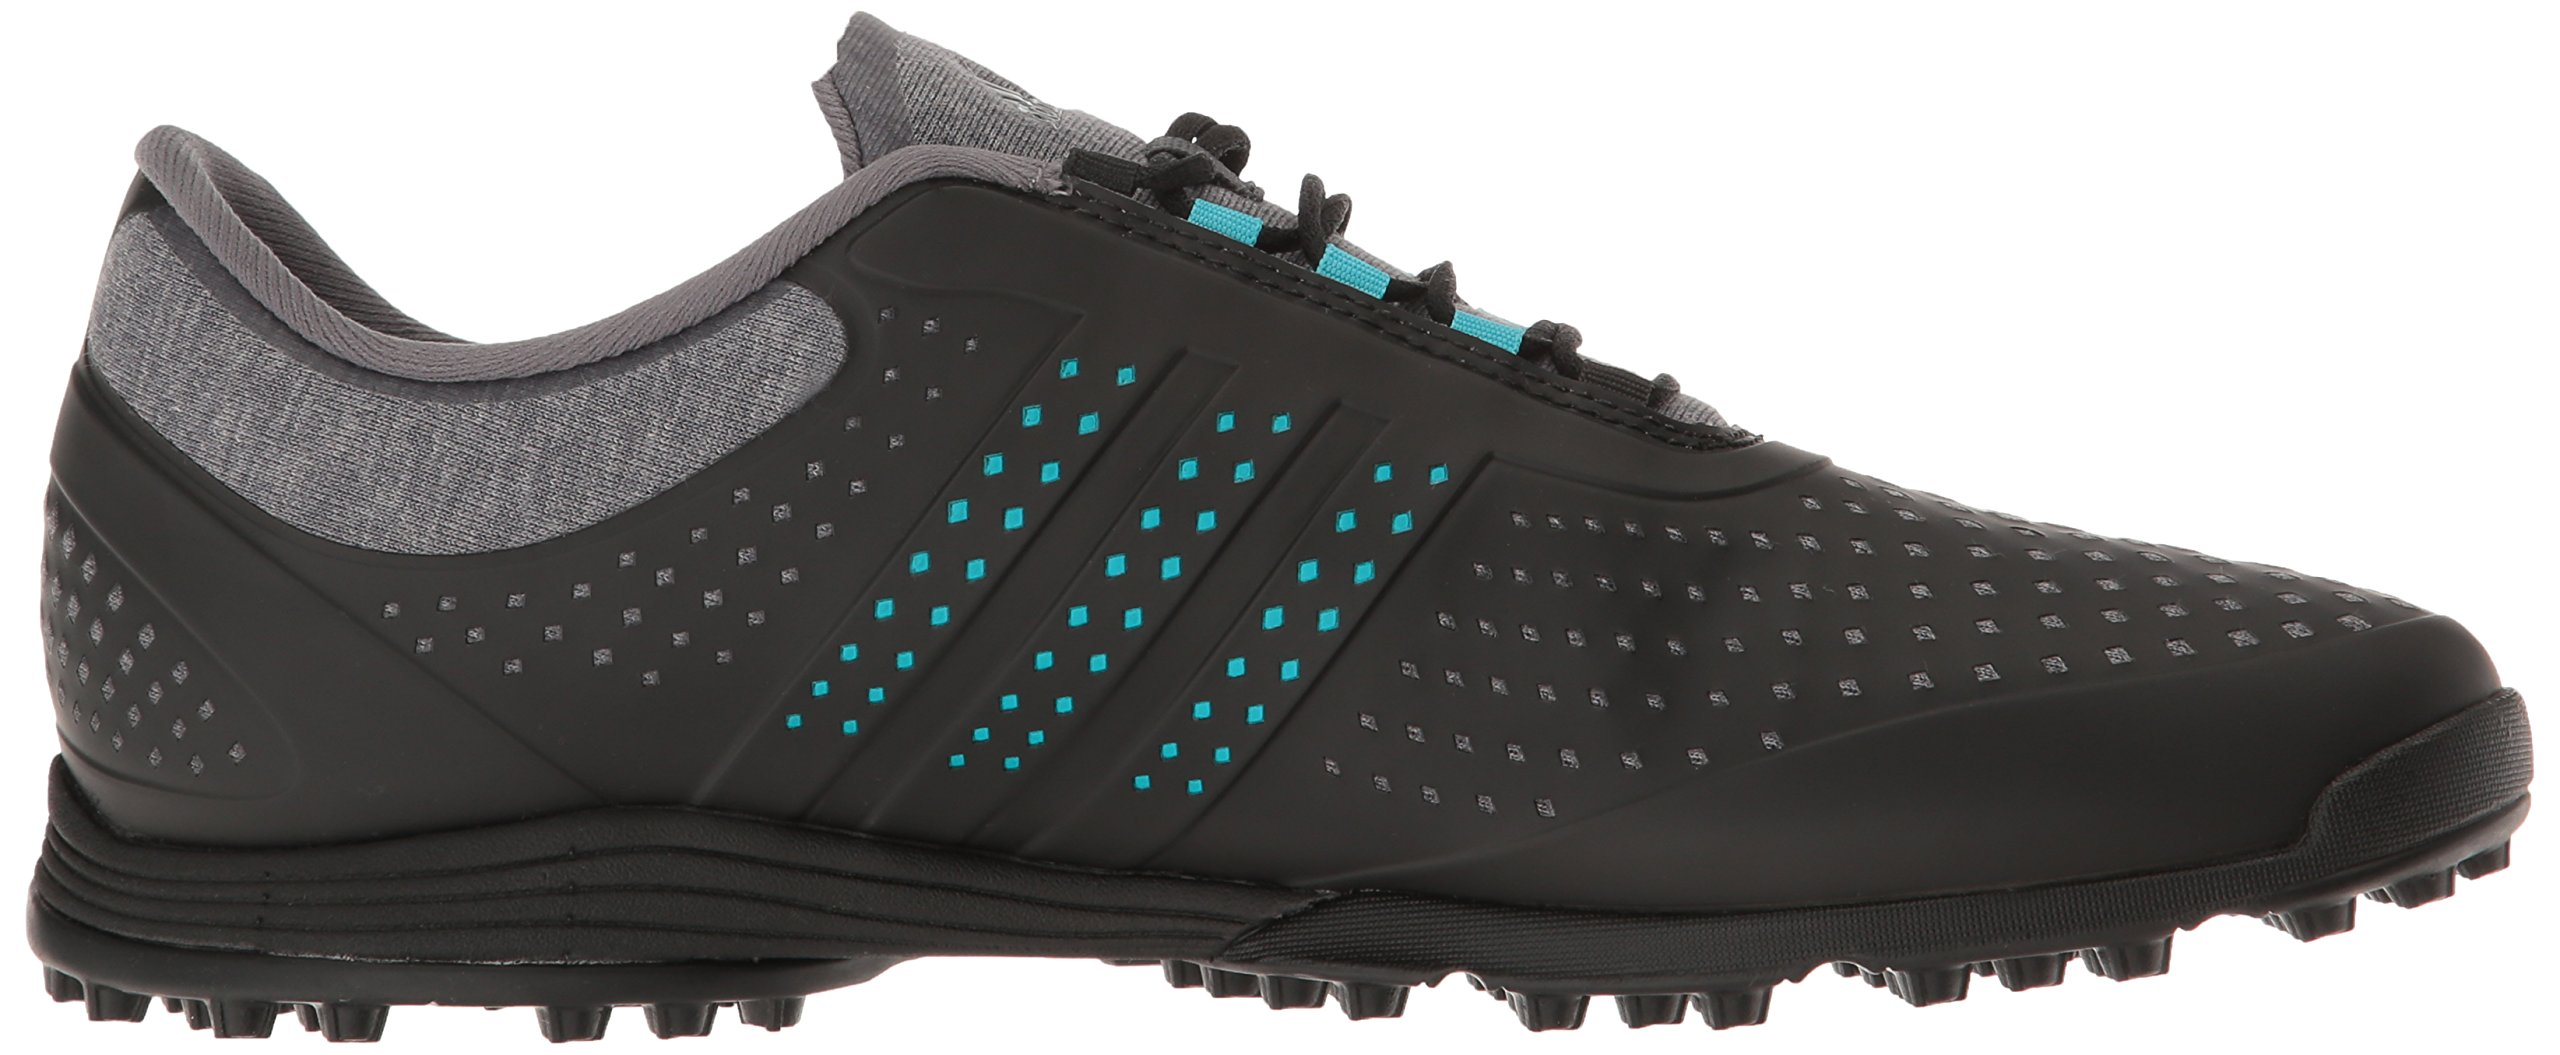 adidas Women's Adipure Sport Golf Shoe, Grey, 7 M US by adidas (Image #7)